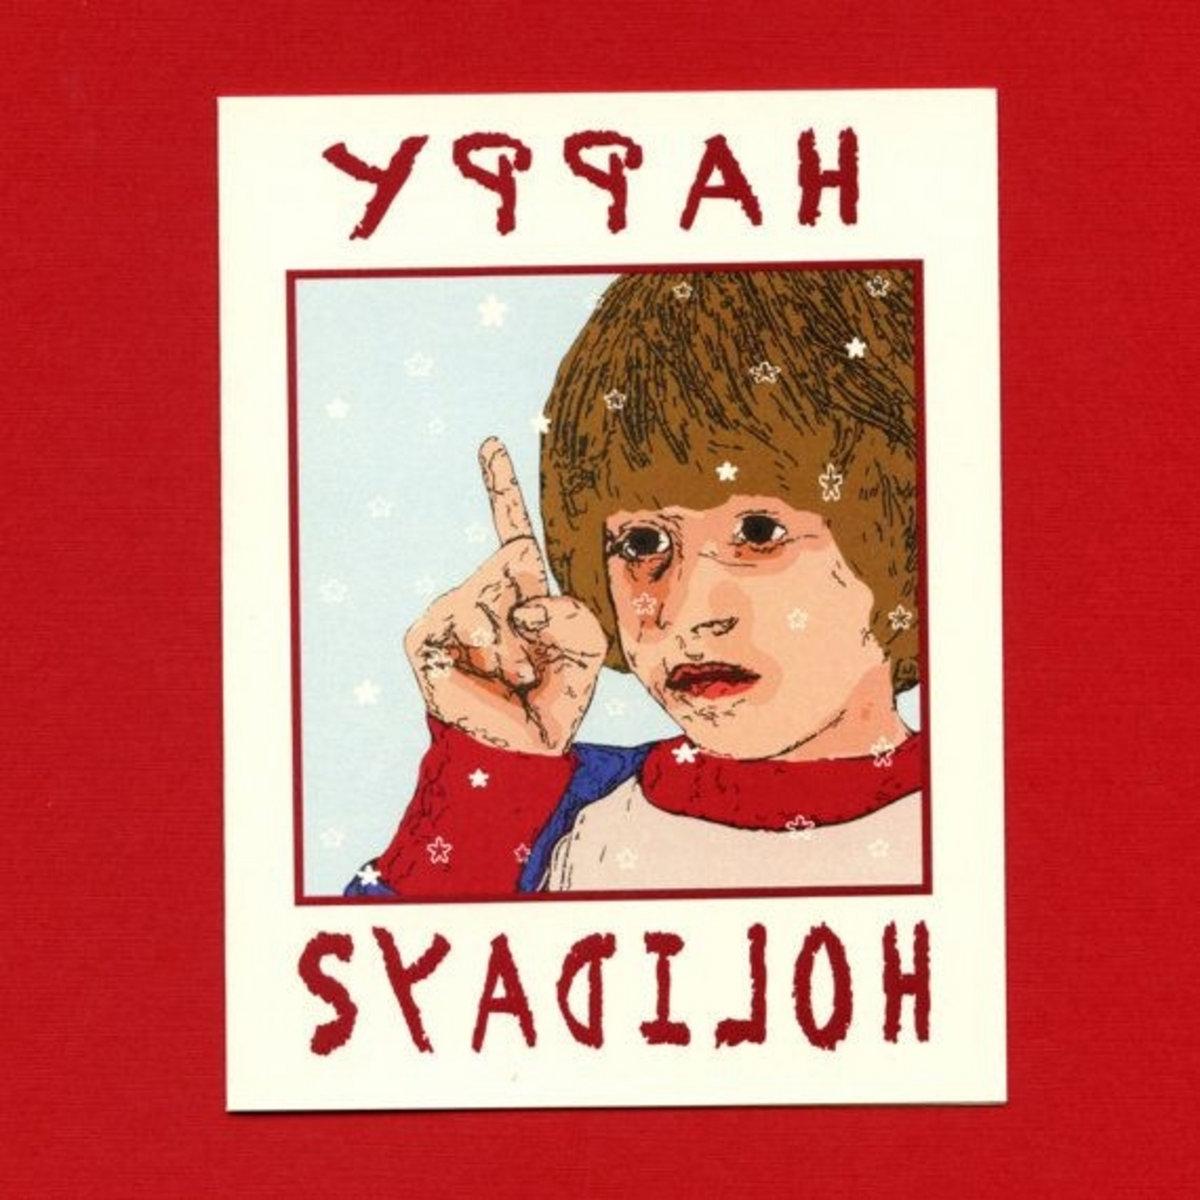 wonderful christmastime paul mccartney cover - A Wonderful Christmas Time